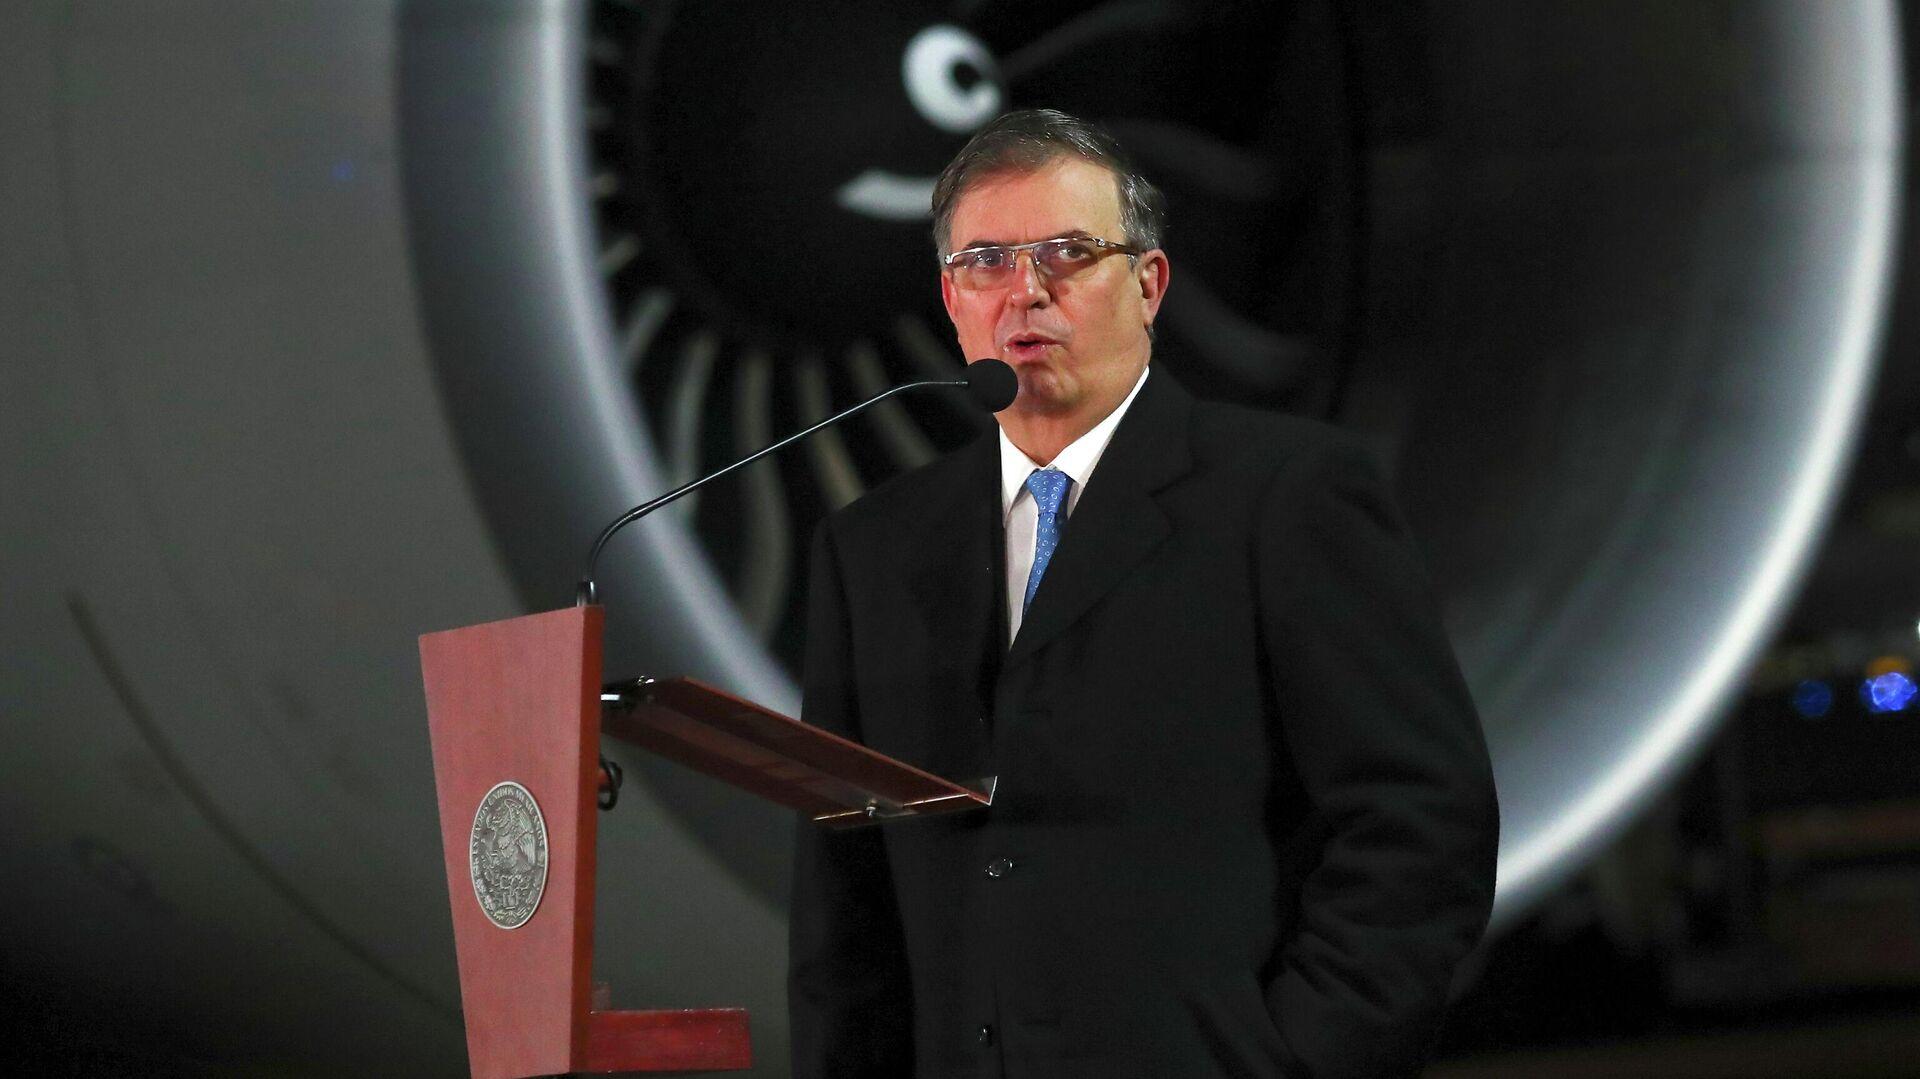 Marcelo Ebrard, canciller de México - Sputnik Mundo, 1920, 27.04.2021